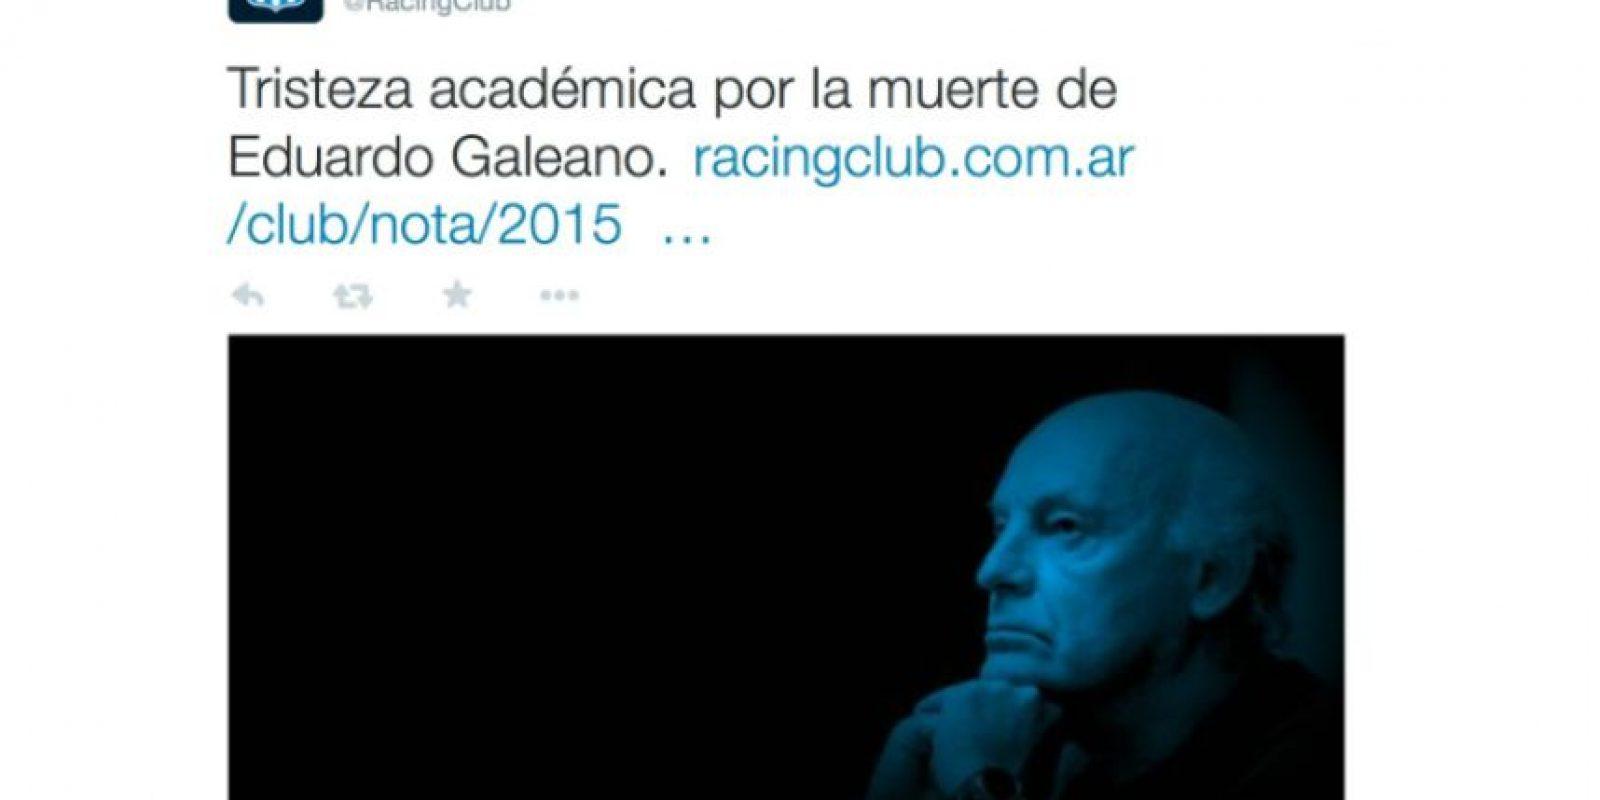 Racing Club, equipo de fútbol de Argentina Foto:Twiiter.com/